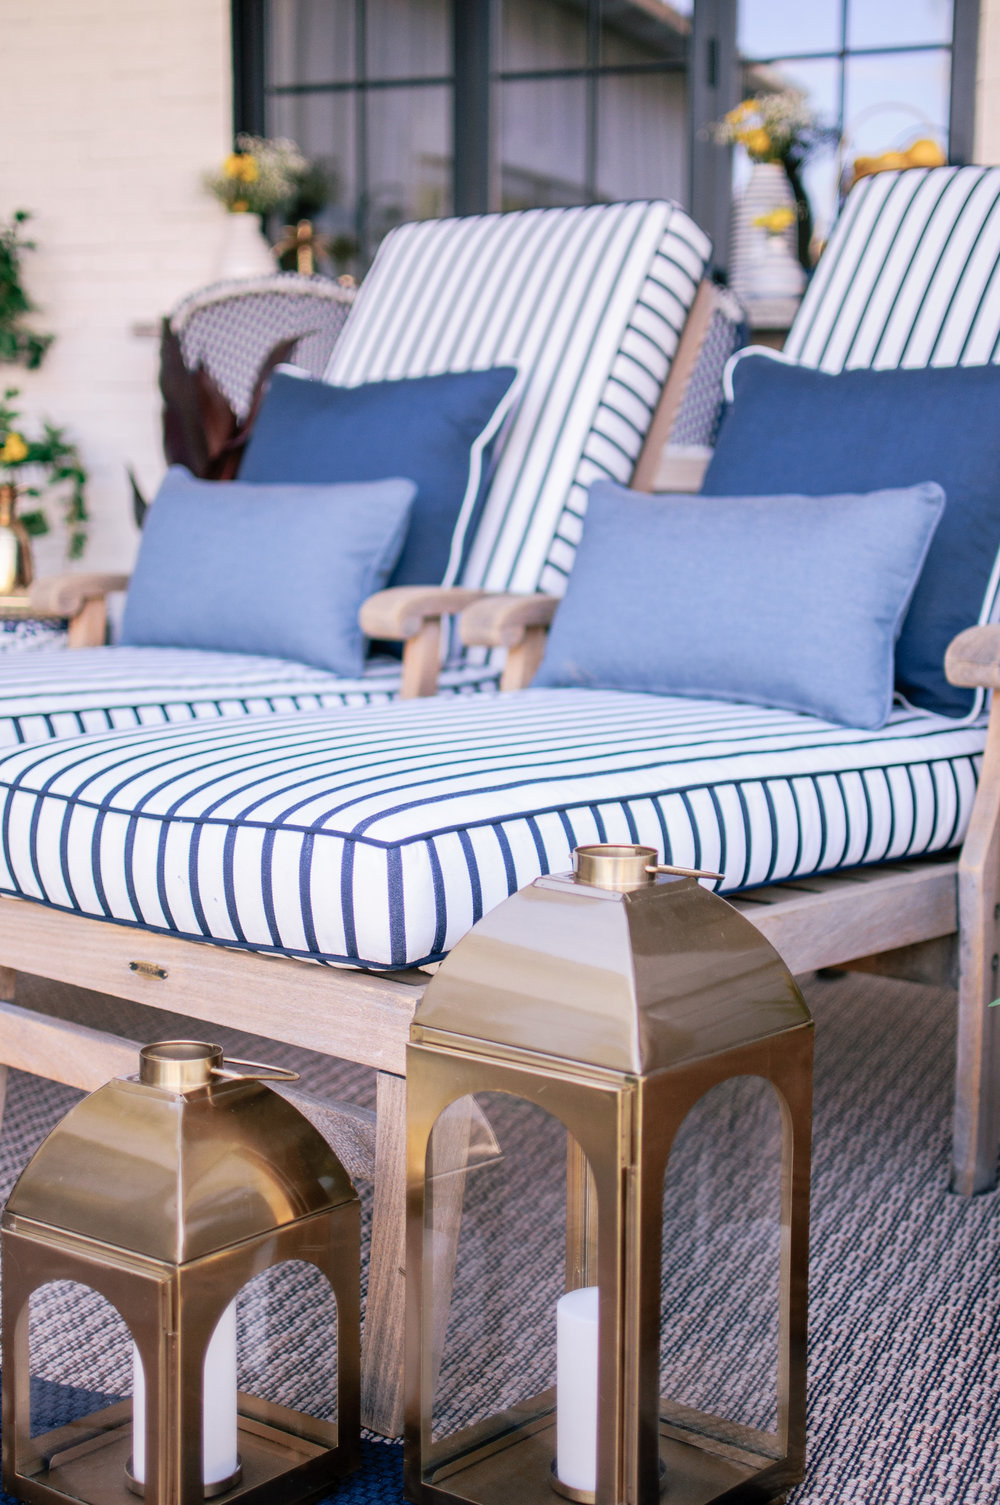 Calico-Sunbrella-Stripe-Fabric-Lido-in-Indigo-5.jpg